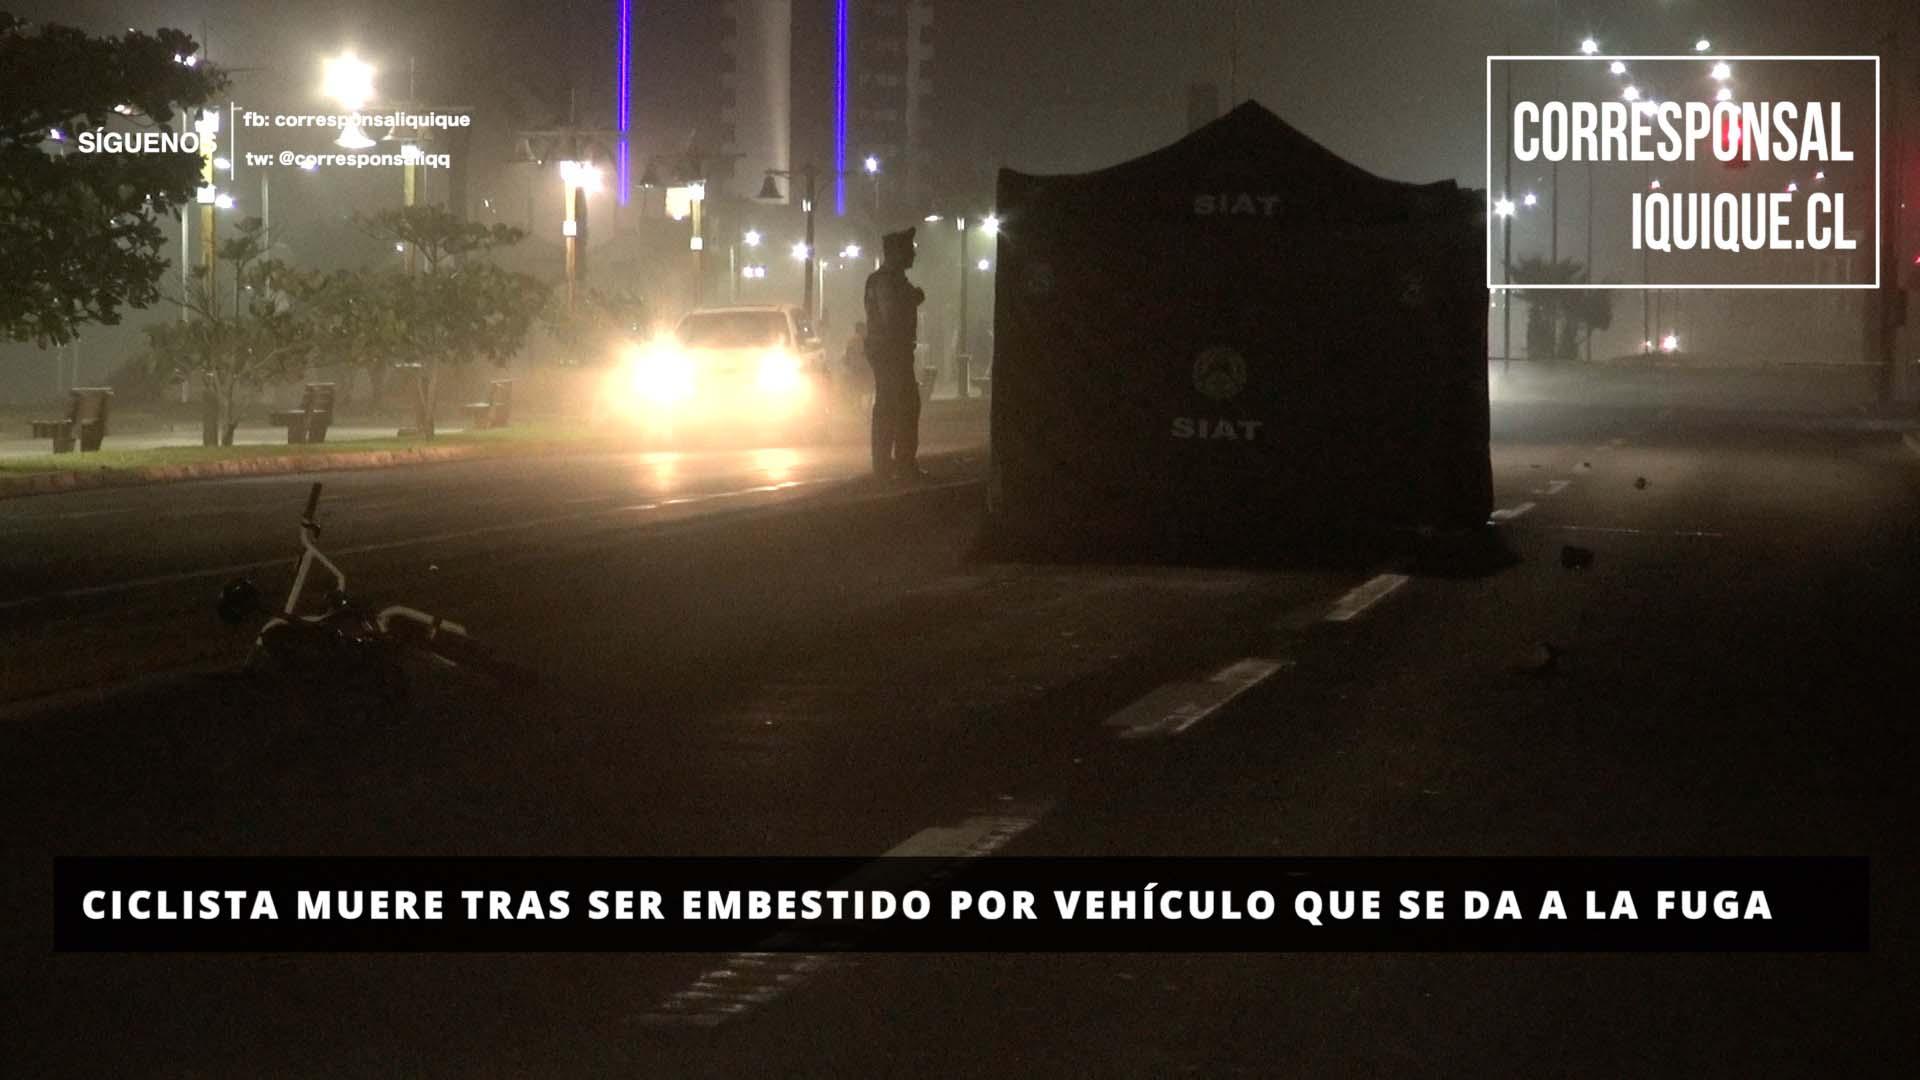 Photo of Ciclista muere tras ser embestido por vehículo que se da a la fuga